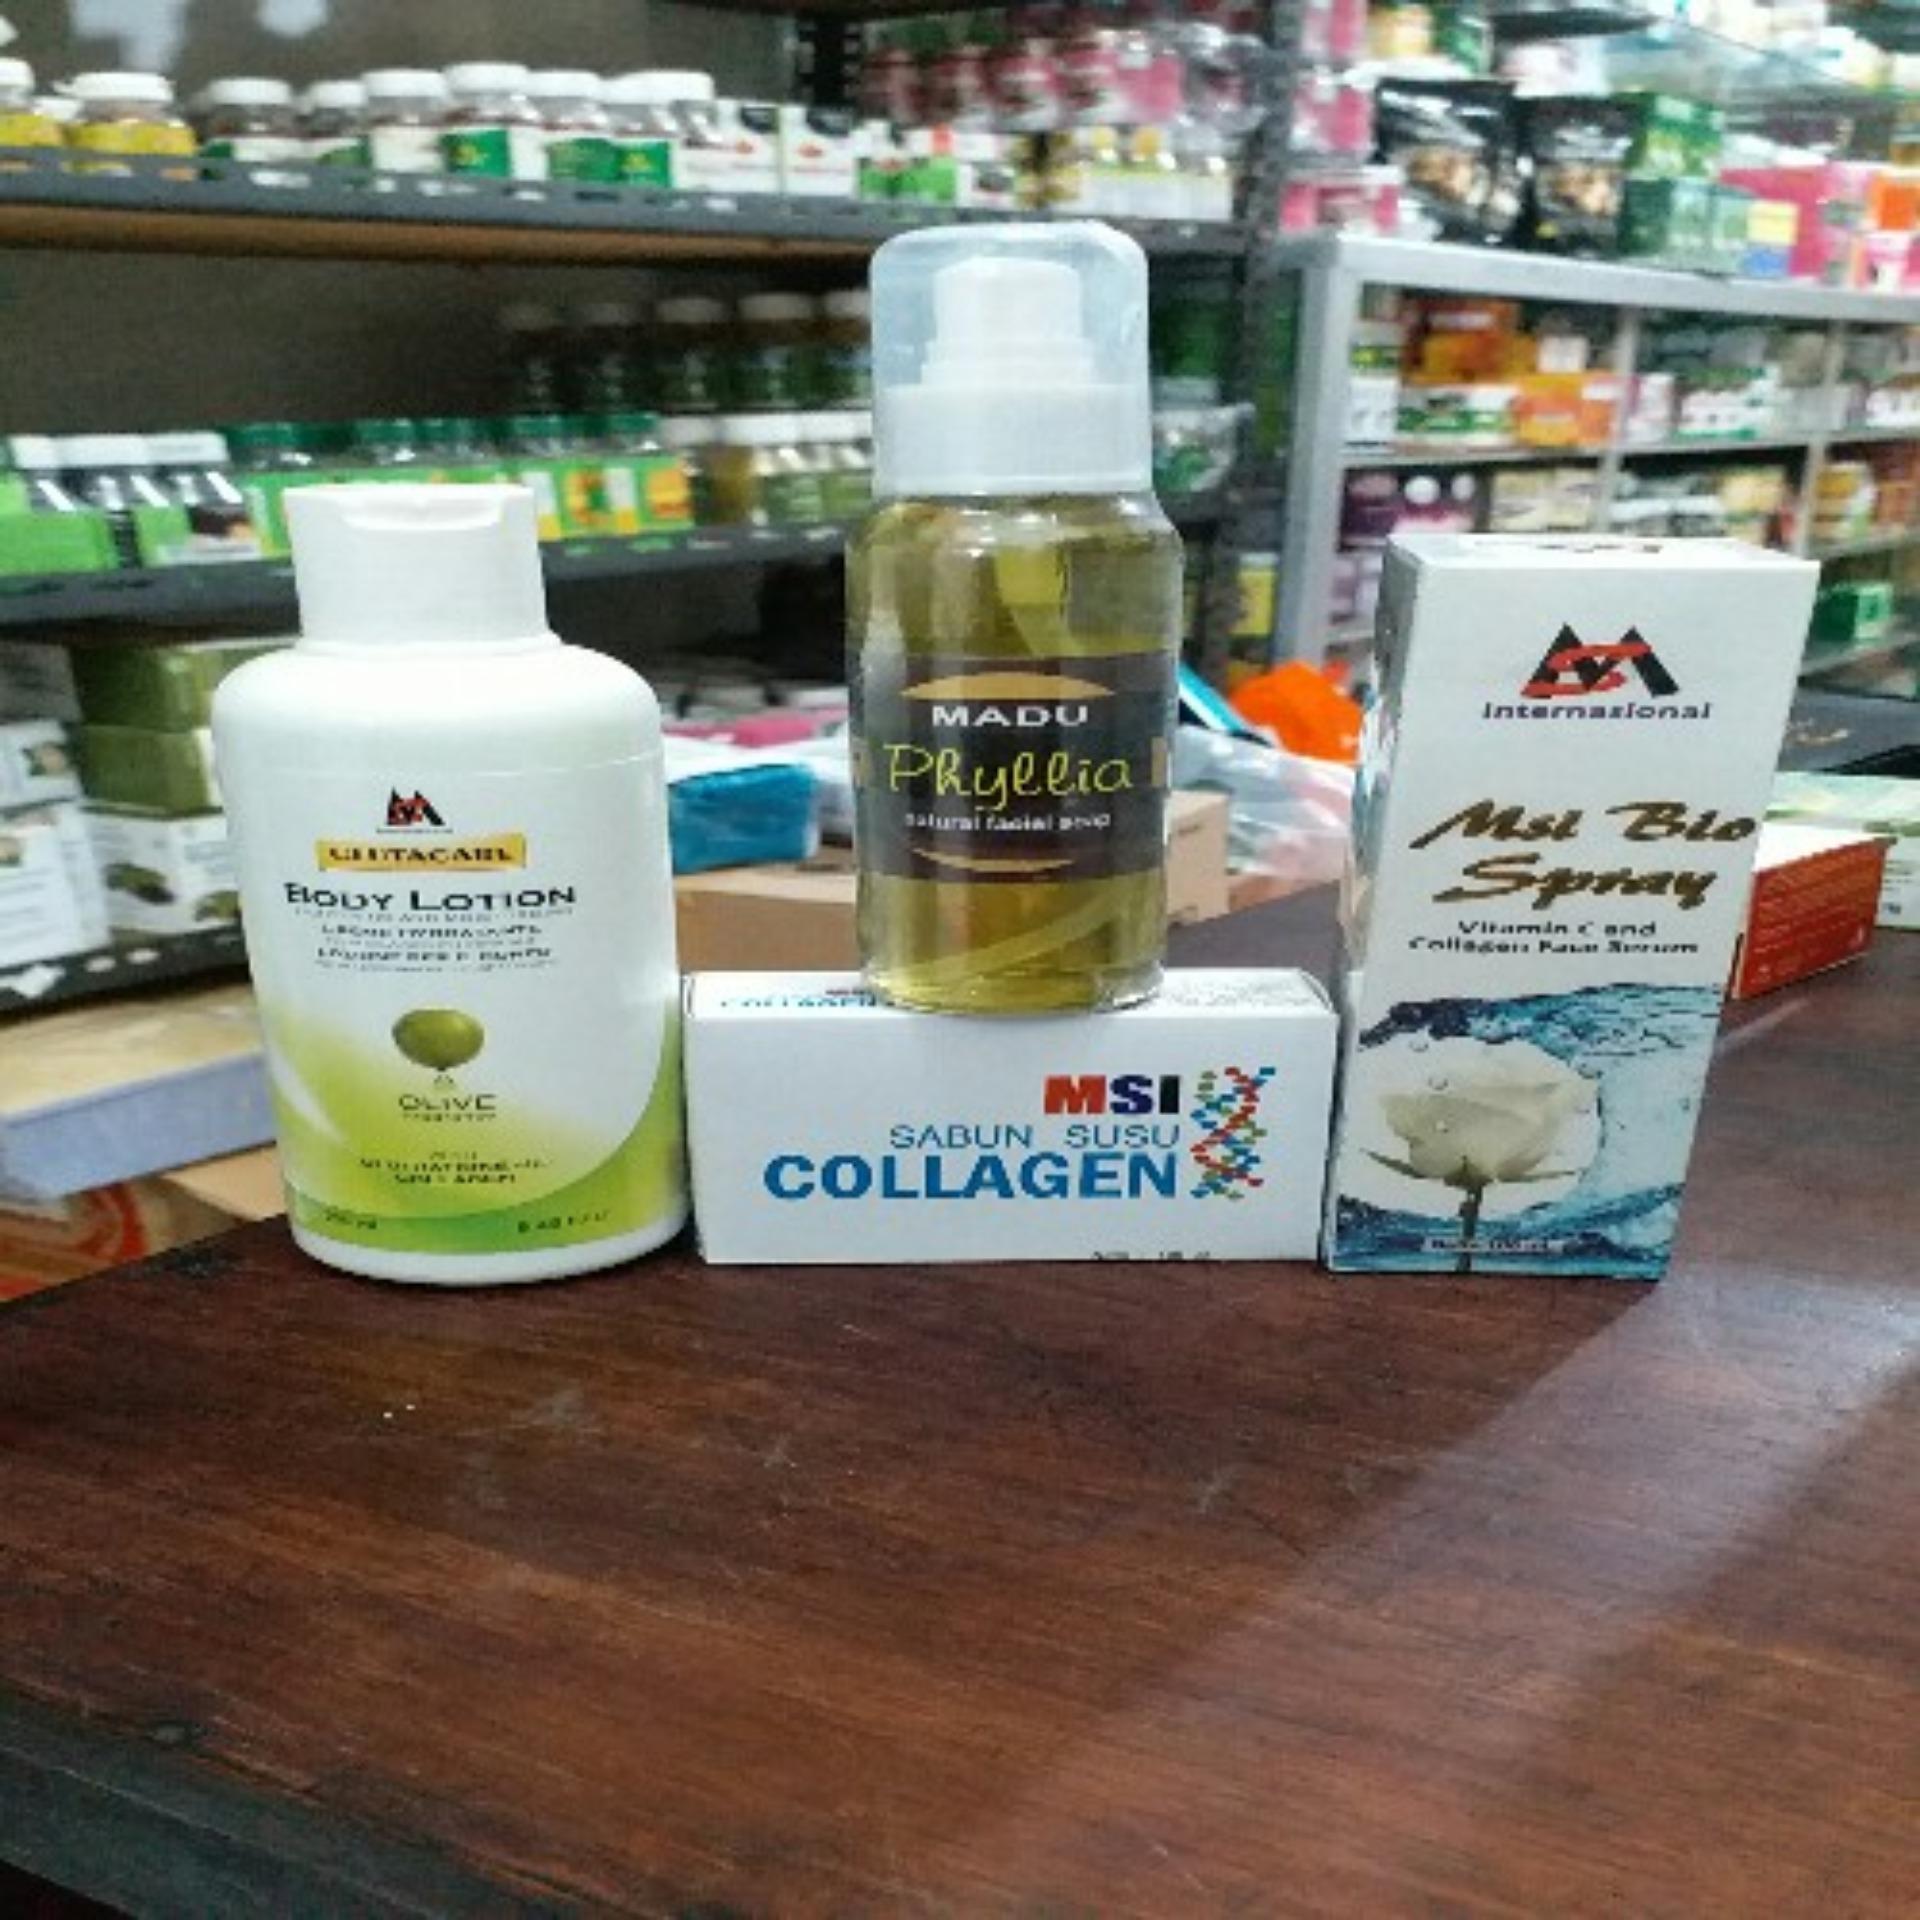 Eshop Checker Msi Paket Glutacare Body Lotion Biospray Produk Herbal Sabun Kologen Madu Phylia